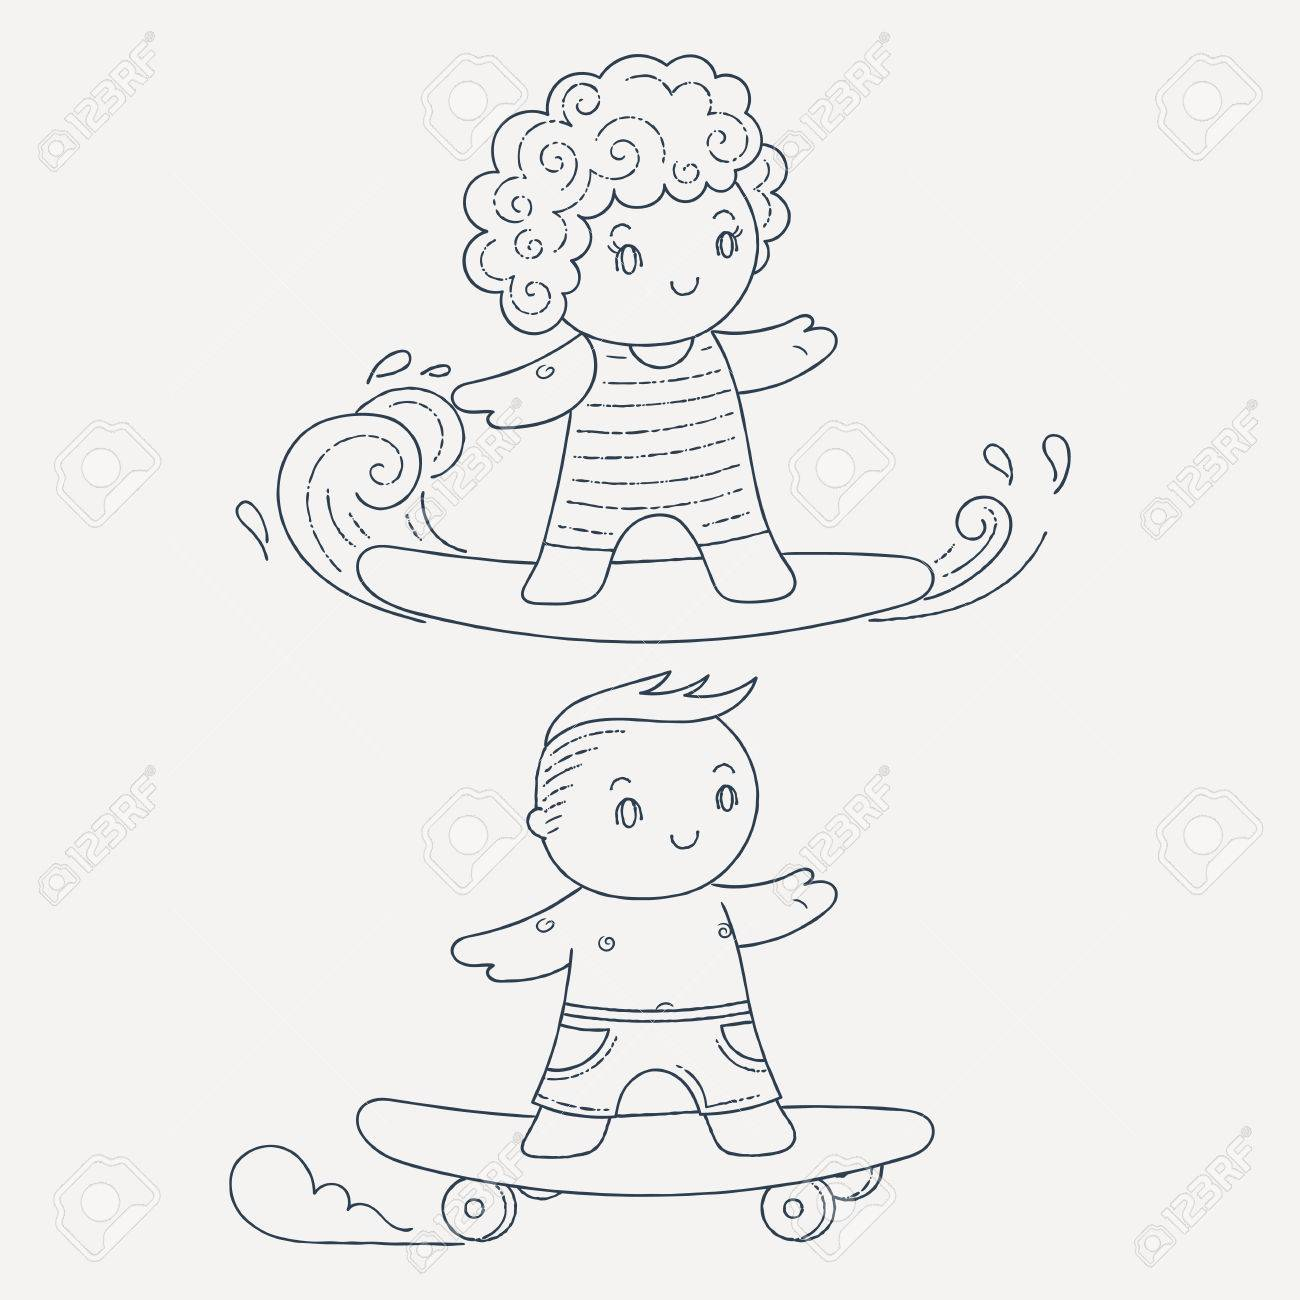 Illustration Of A Kids On A Surfboard And Skateboard. Kawaii ...